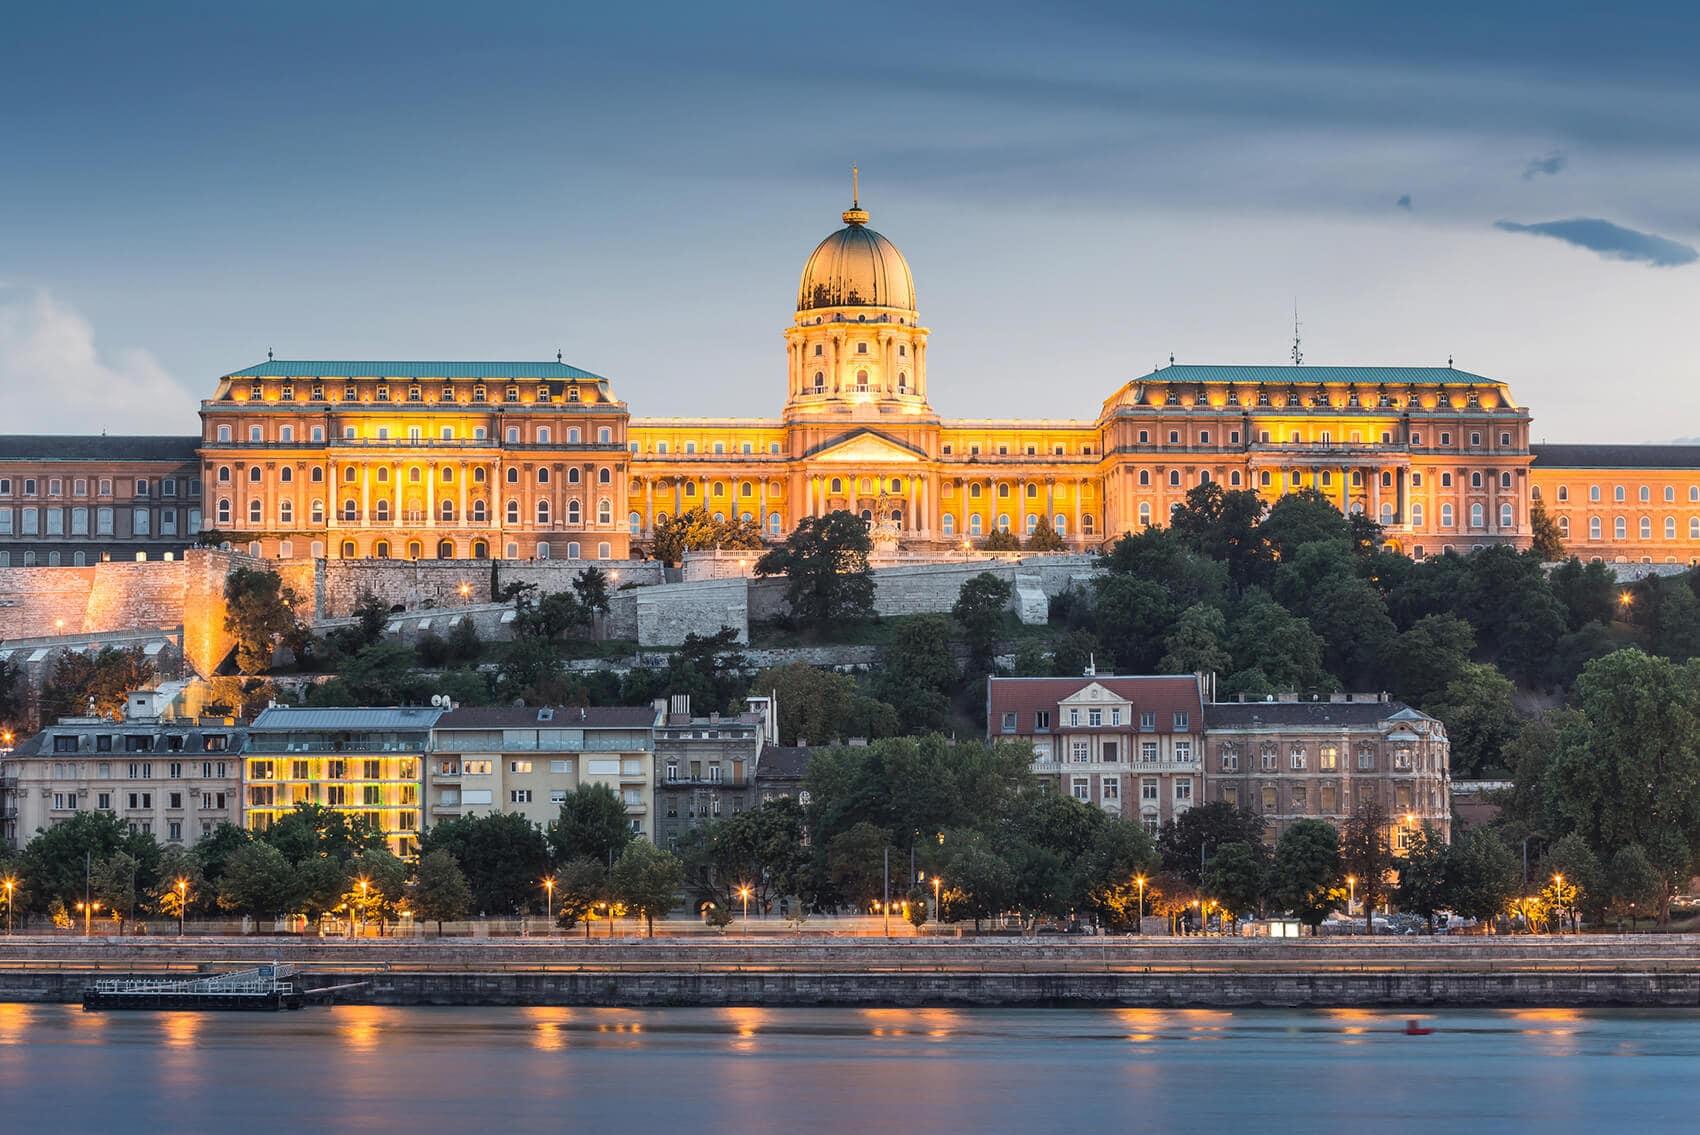 Budapest Instagram photo guide - Buda Castle at sunset